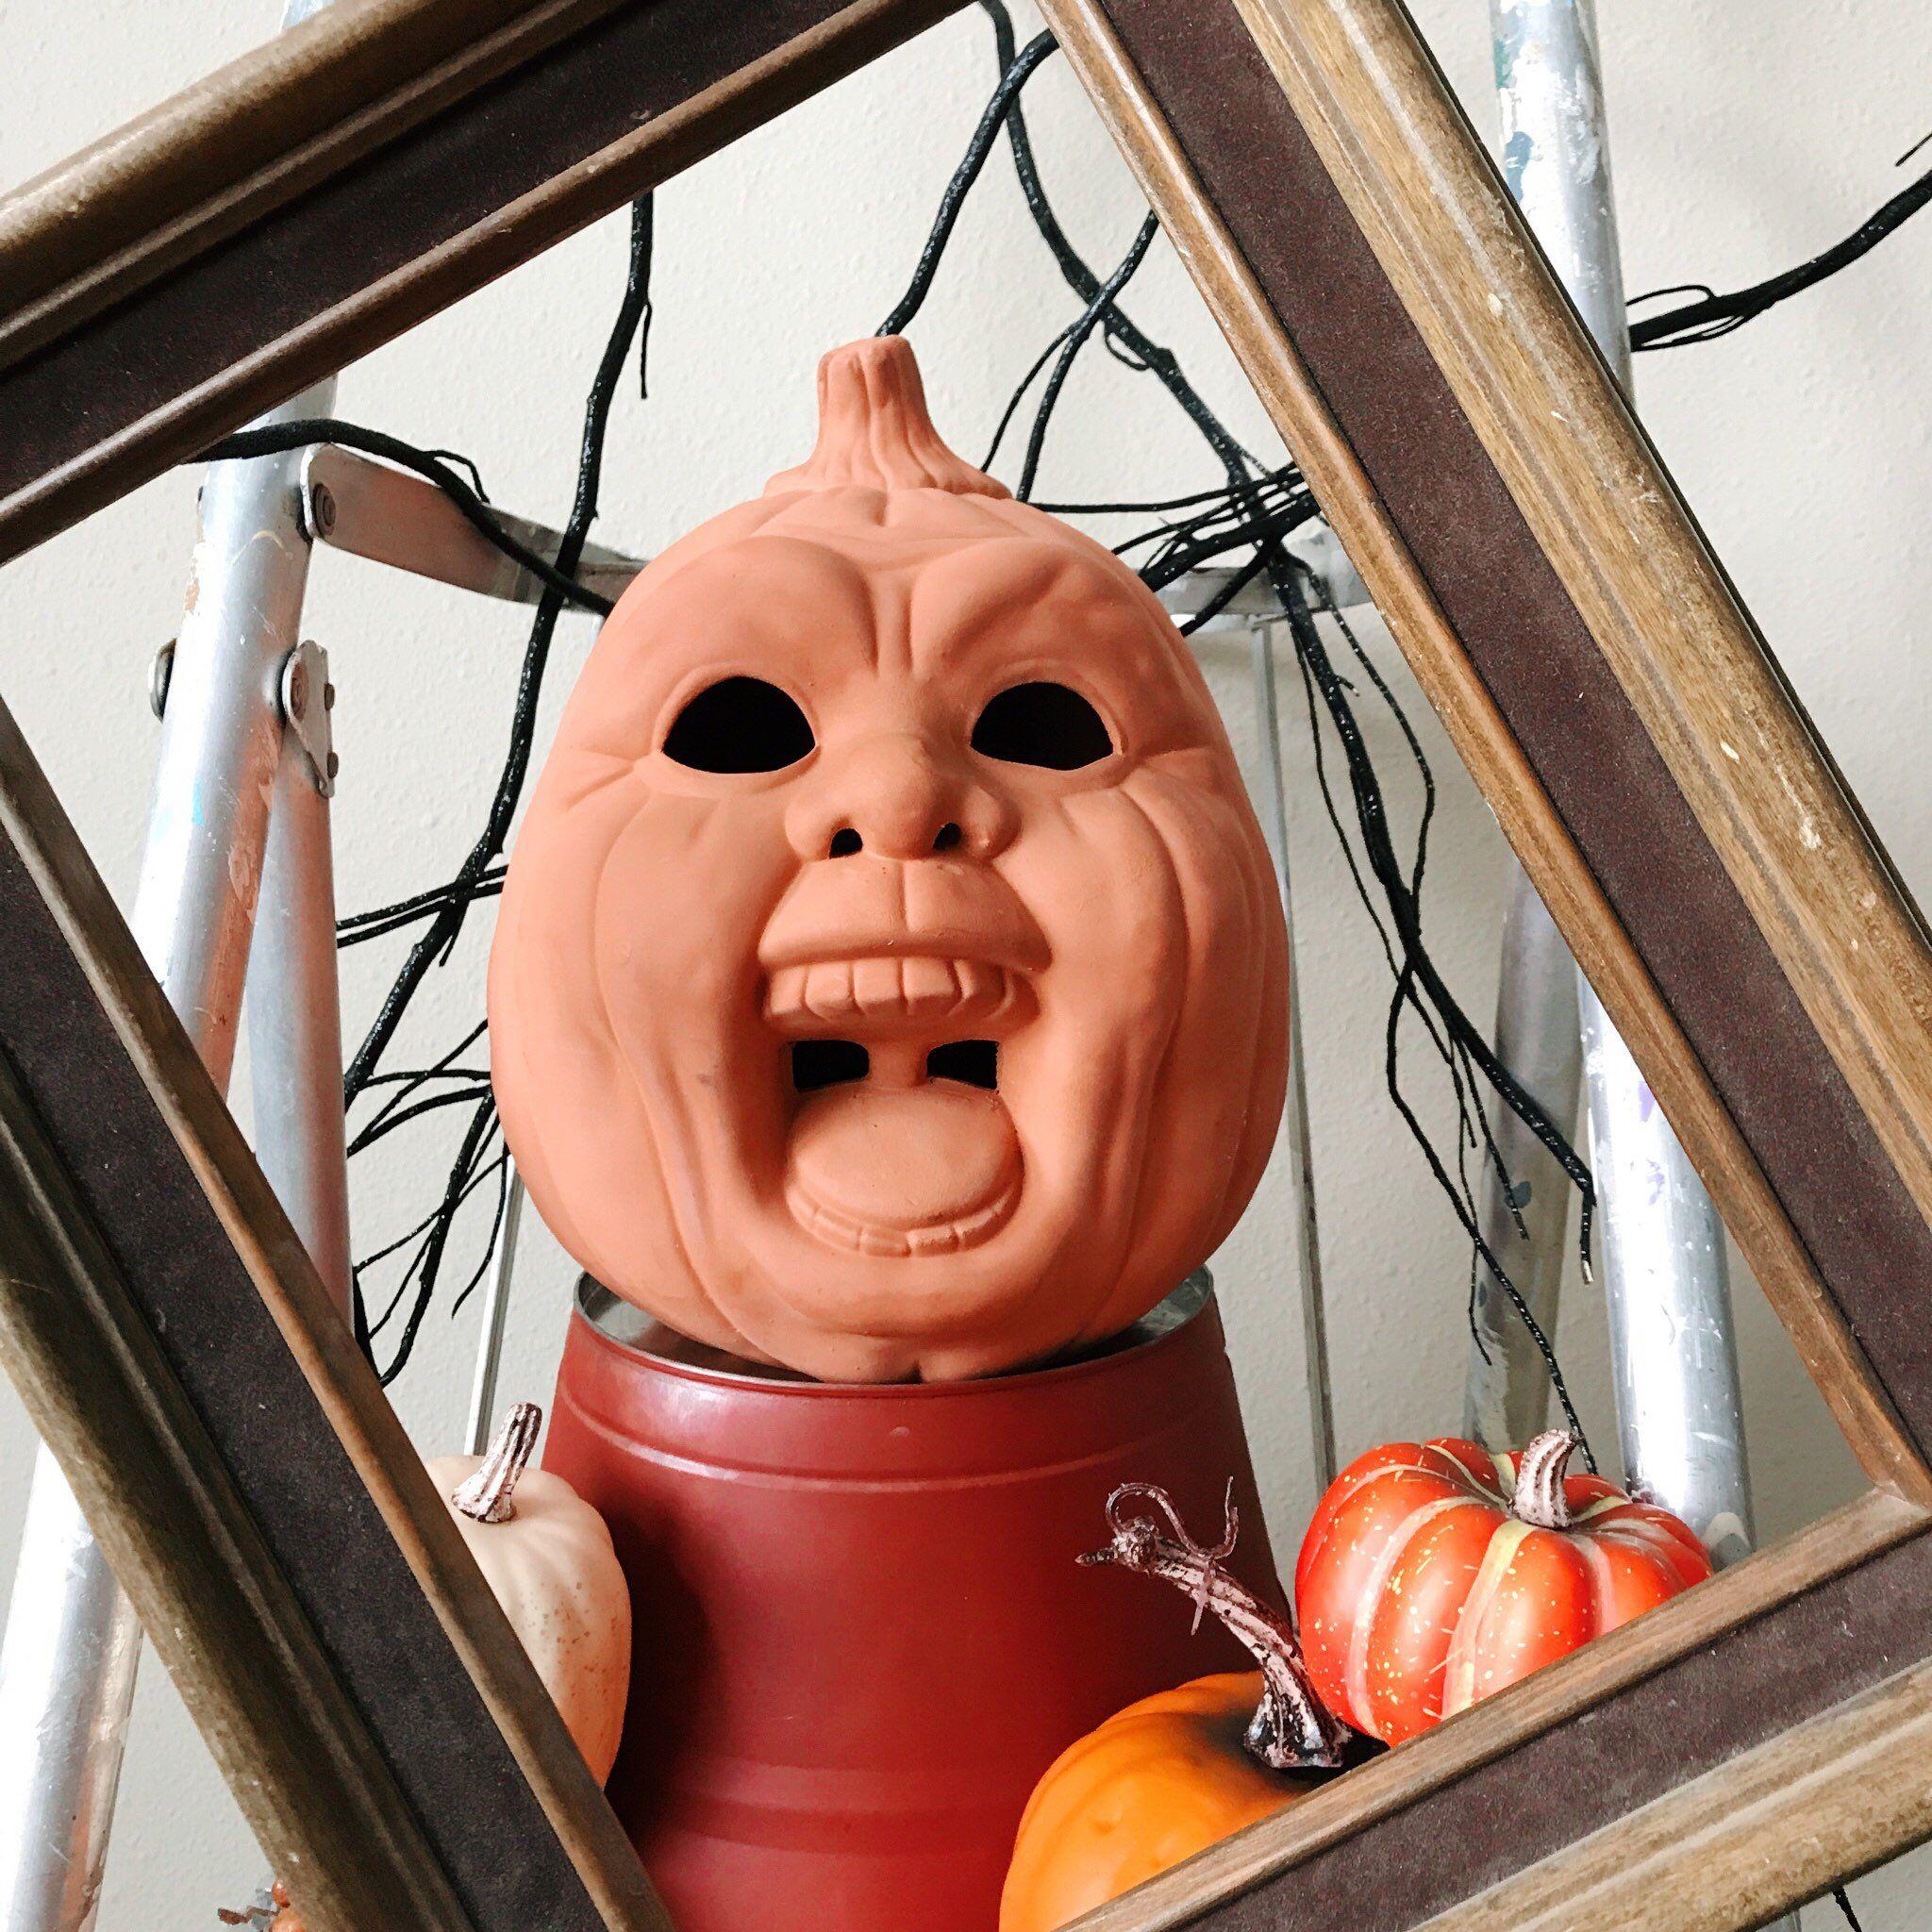 The Screaming Pumpkin Man Scary Vintage 1980s Artisan Crafted Terracotta Jack O Lantern Autumn Pott Halloween Jack O Lanterns Fall Garden Decor Jack O Lantern